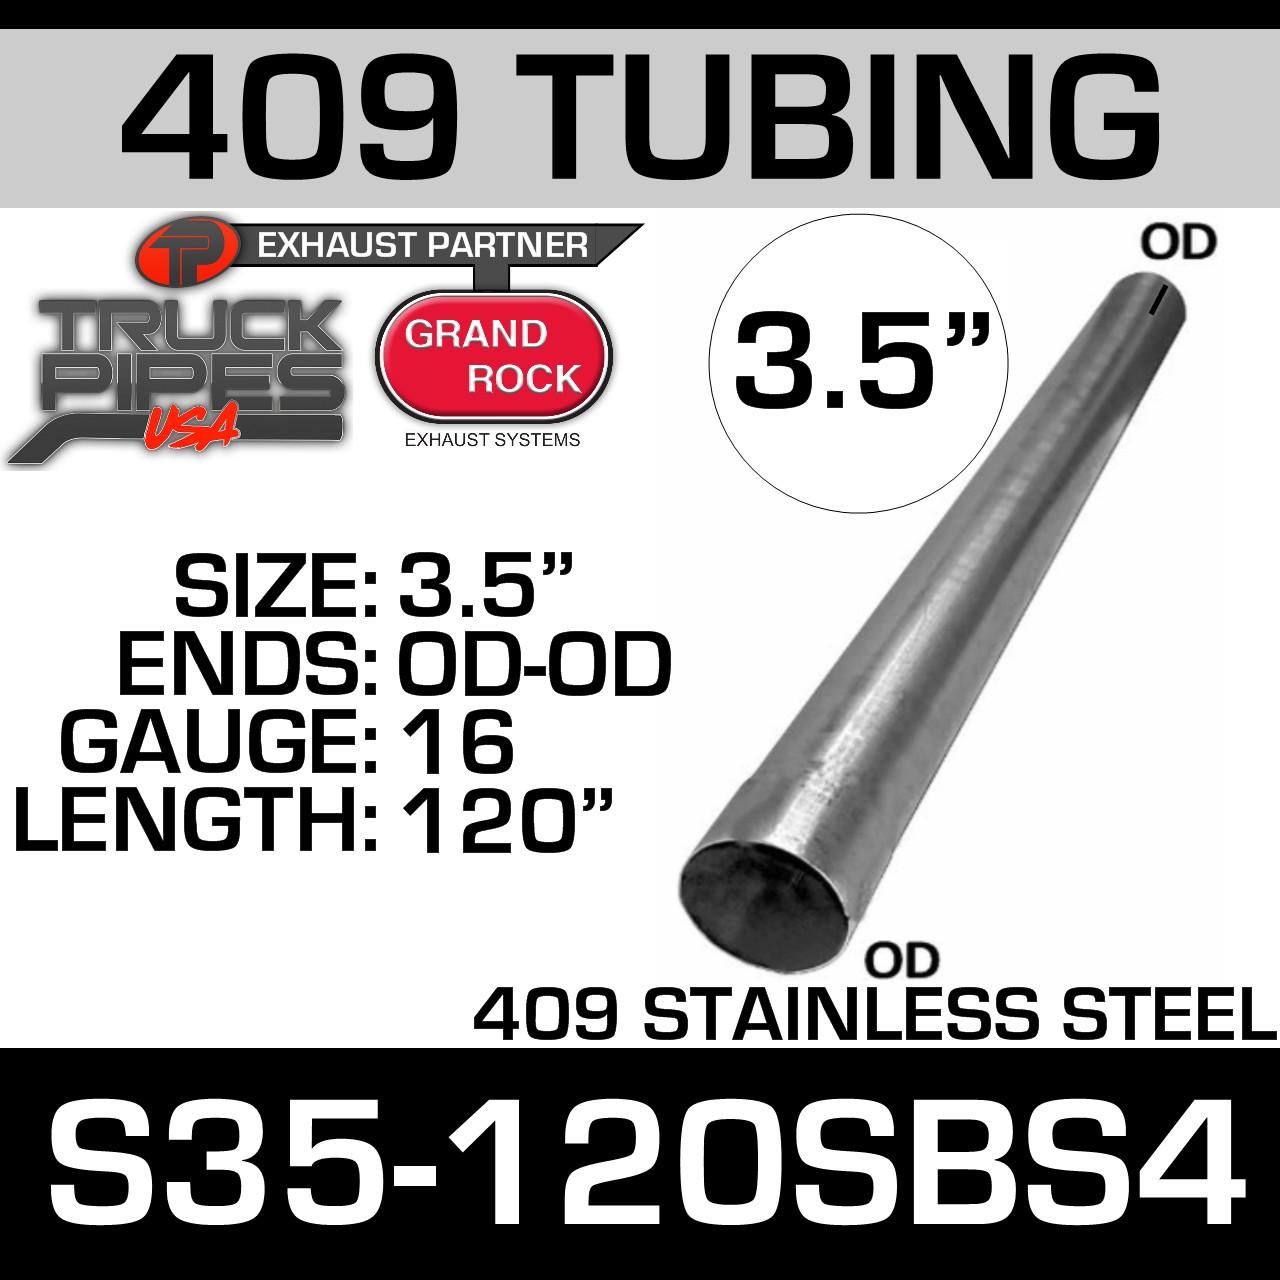 s35-120sbs4-409-steel-exhaust-tubing-3-5-inch-diameter-od-end-120-inches-long.jpg